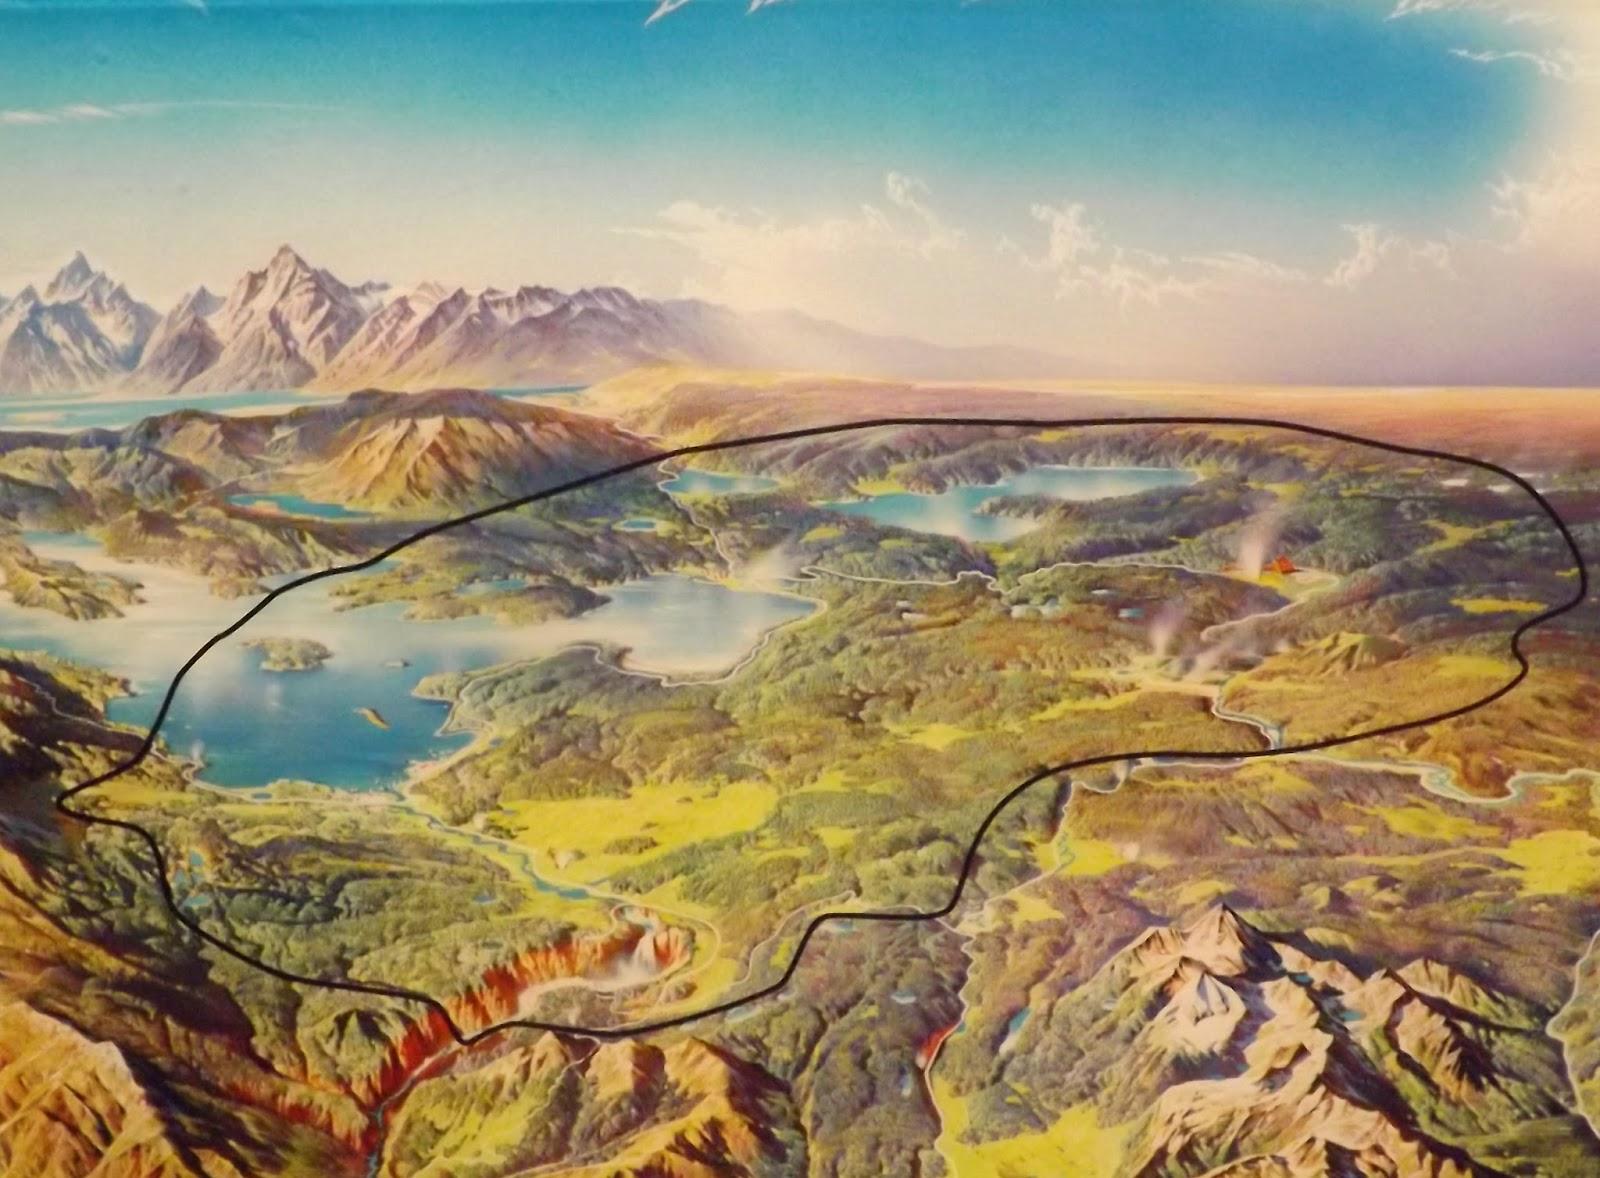 Yellowstone Volcano Diagram Hand Skeleton Hot Springs And Geysers Arkansas